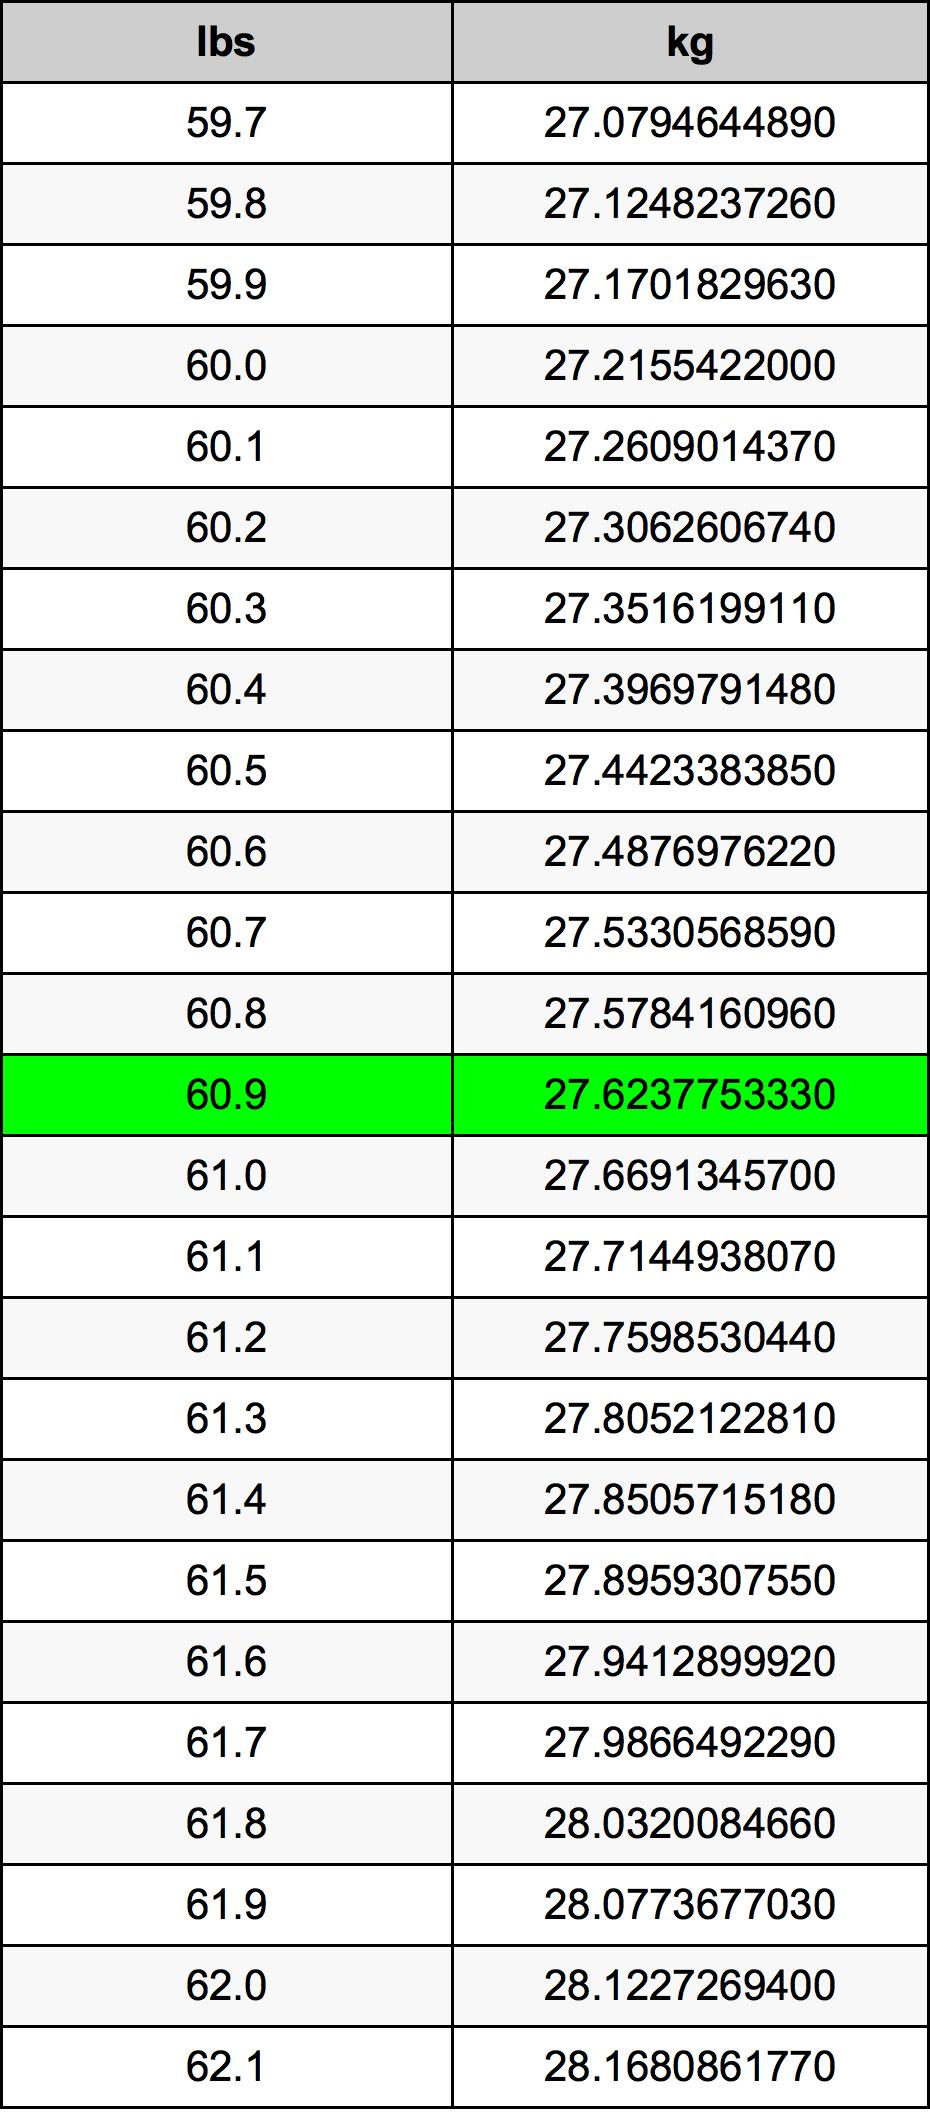 60.9 Libra konverteringstabellen